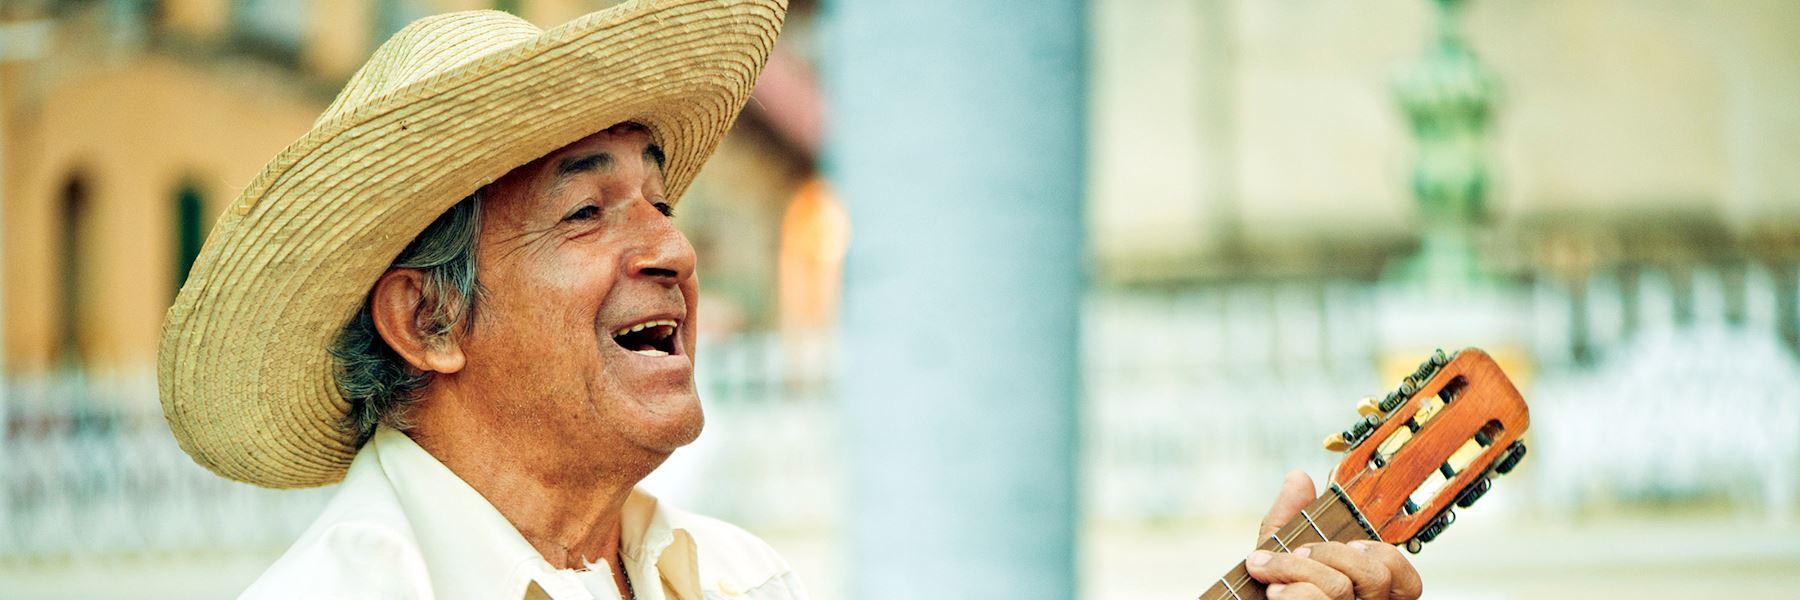 Cuba travel guides